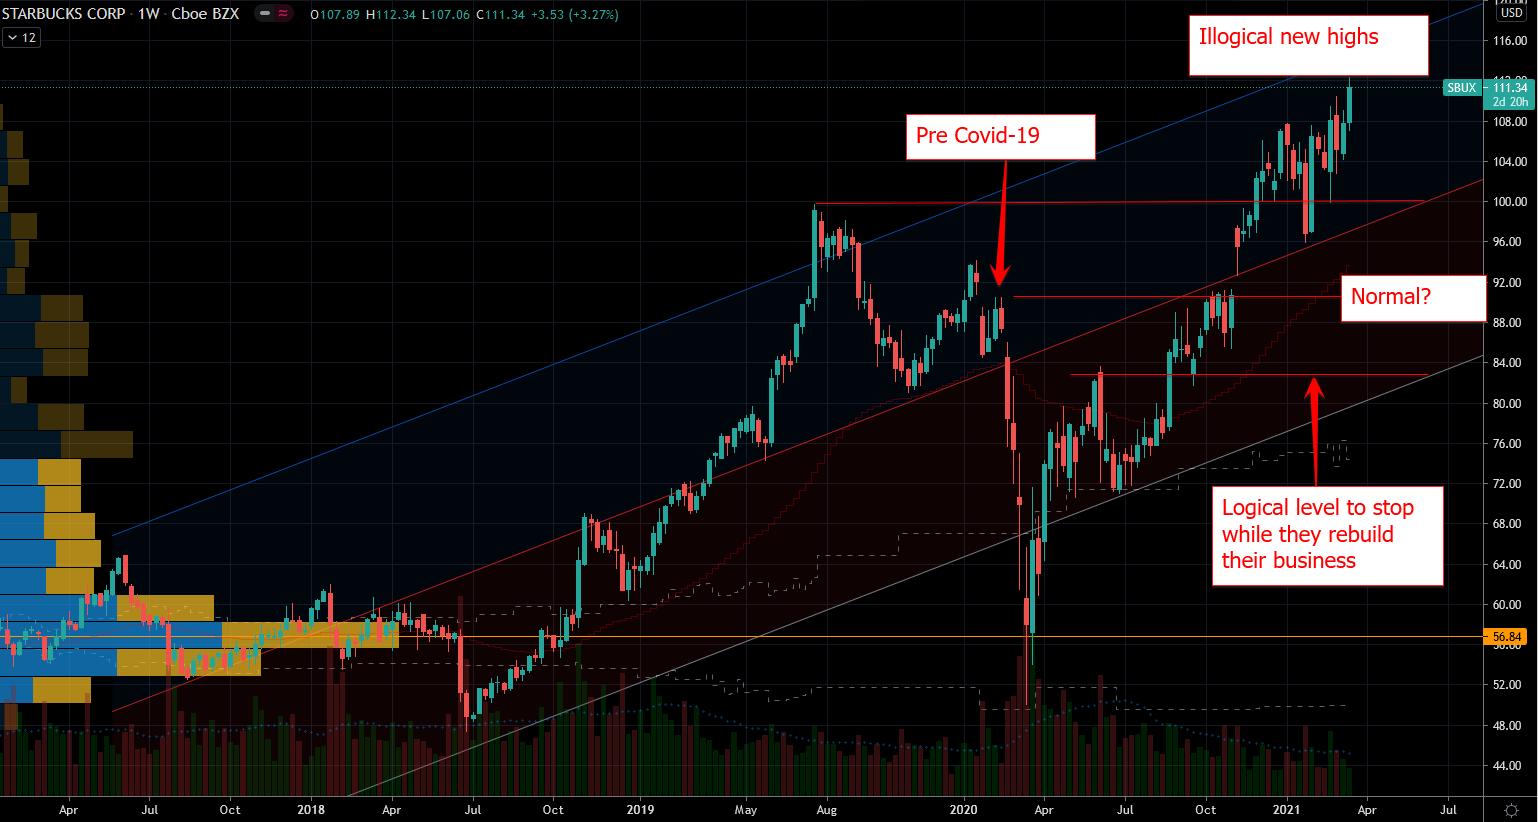 Starbucks SBUX Stock Chart Showing Overshoot in Price